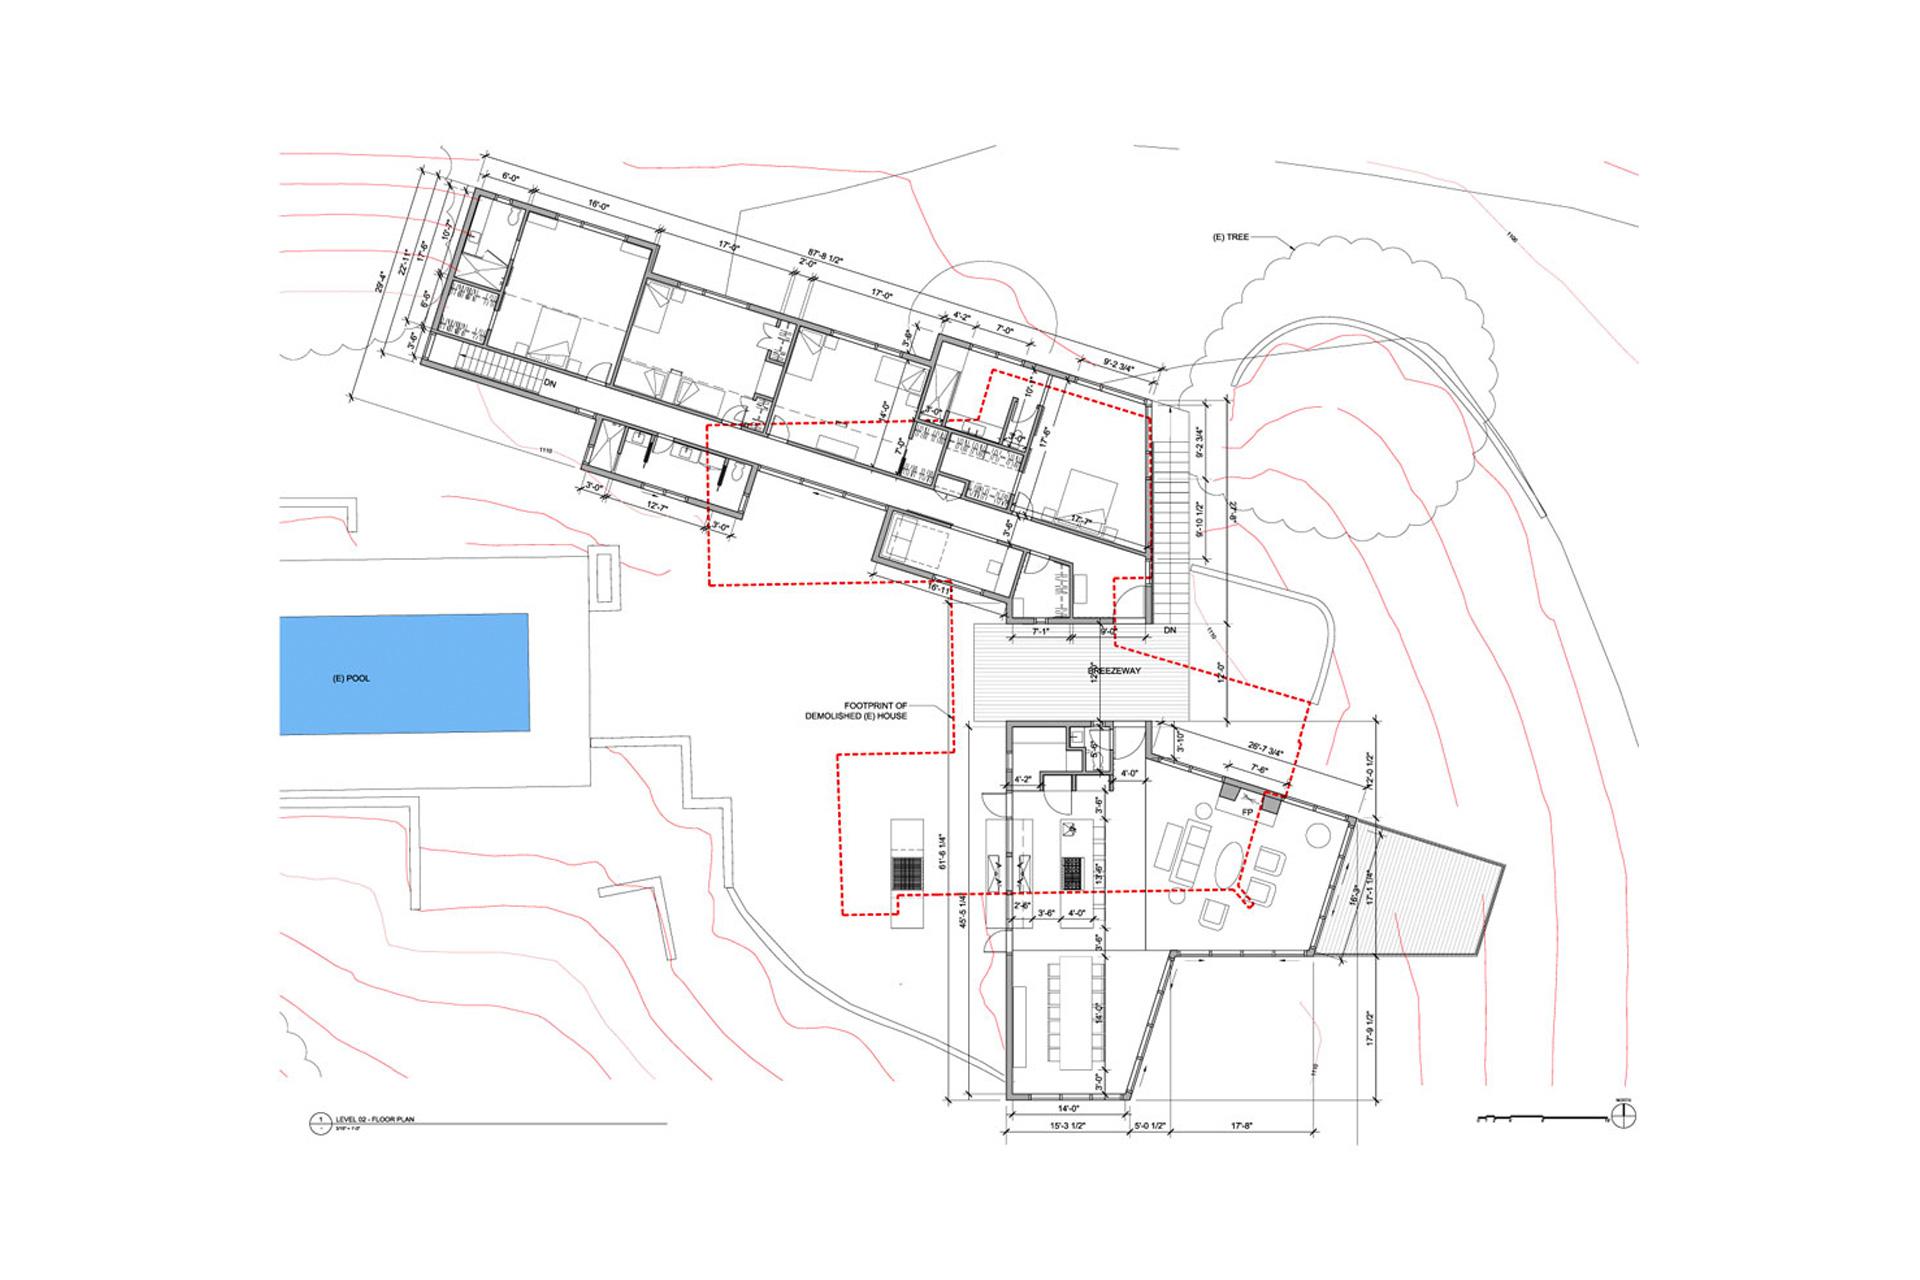 Mount Veeder Residence design ideas